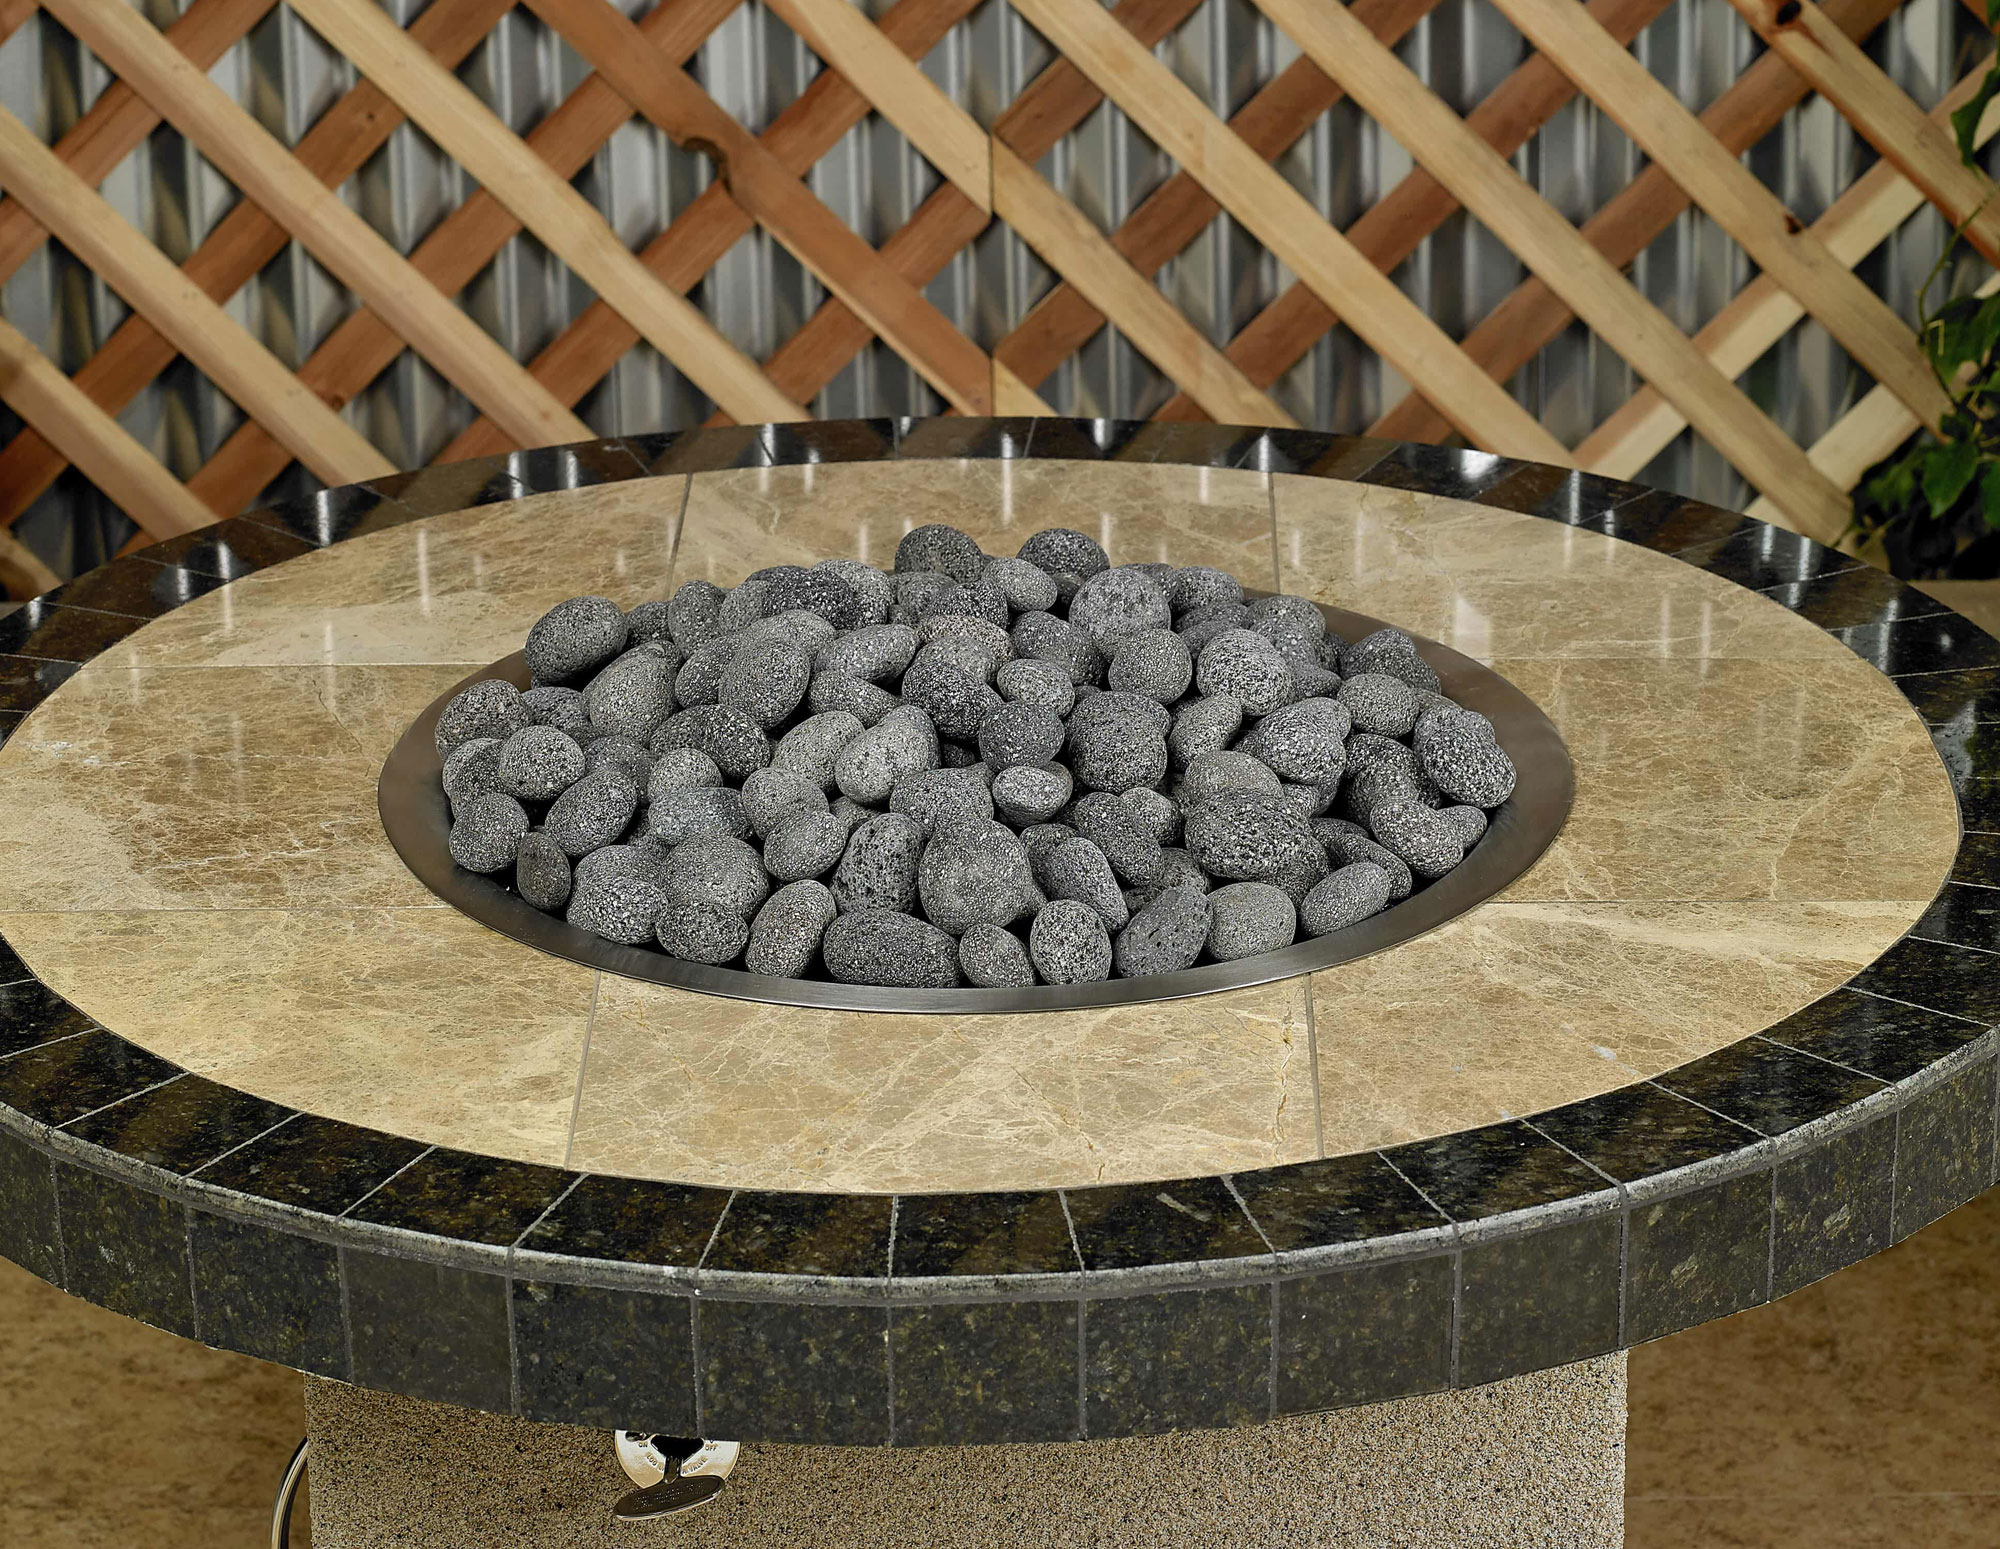 Medium Gray Lava Stone 1 - 2 Inches